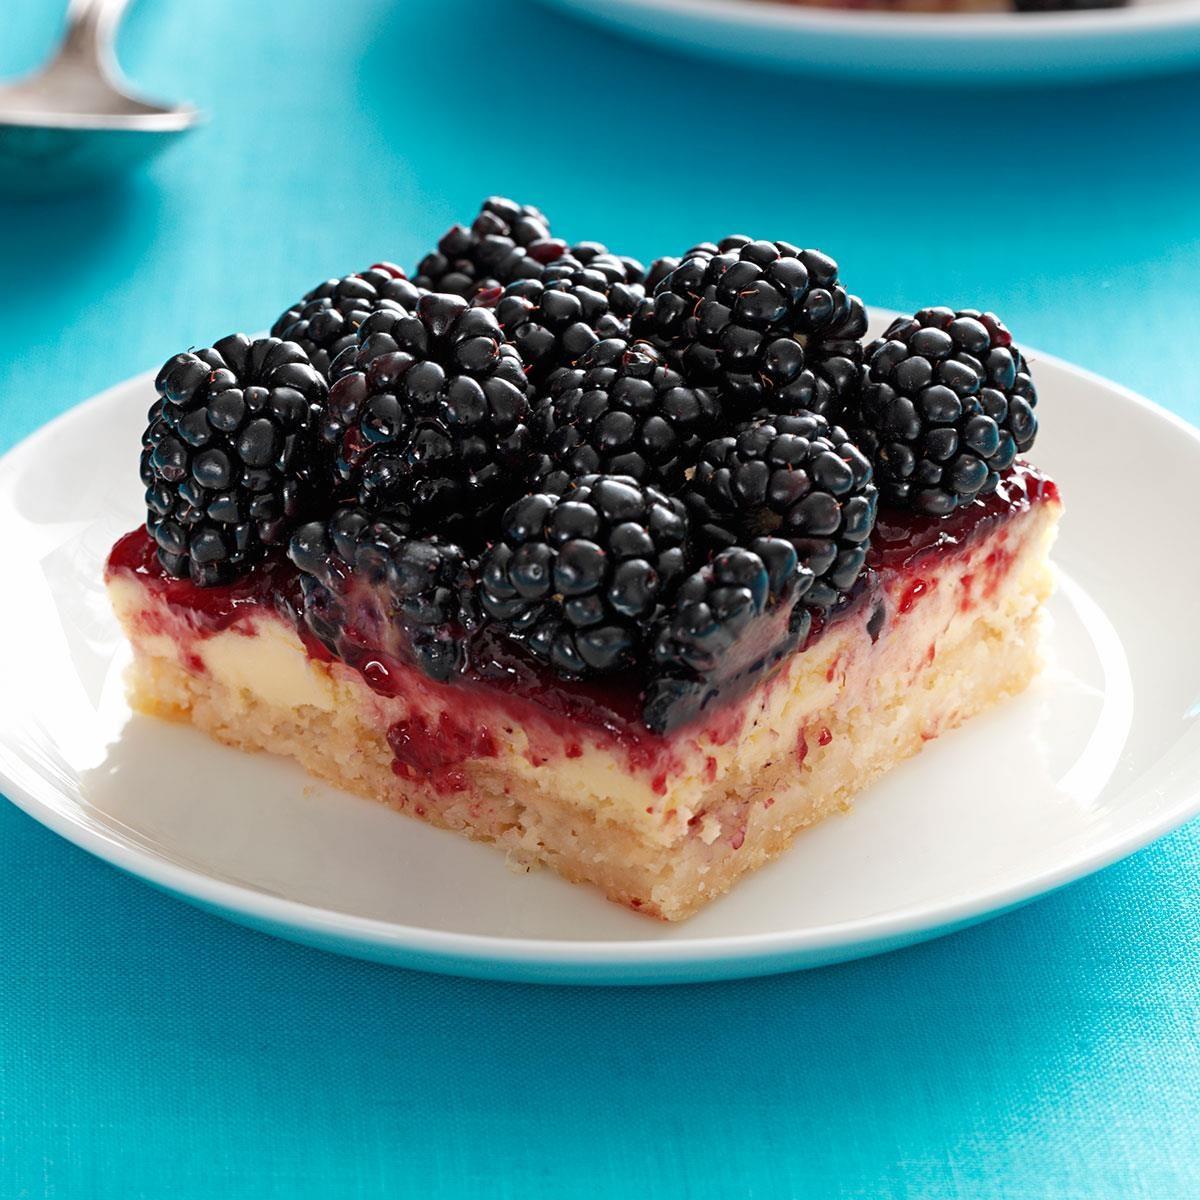 Blackberry Dessert Recipes: Blackberry Cheesecake Bars Recipe